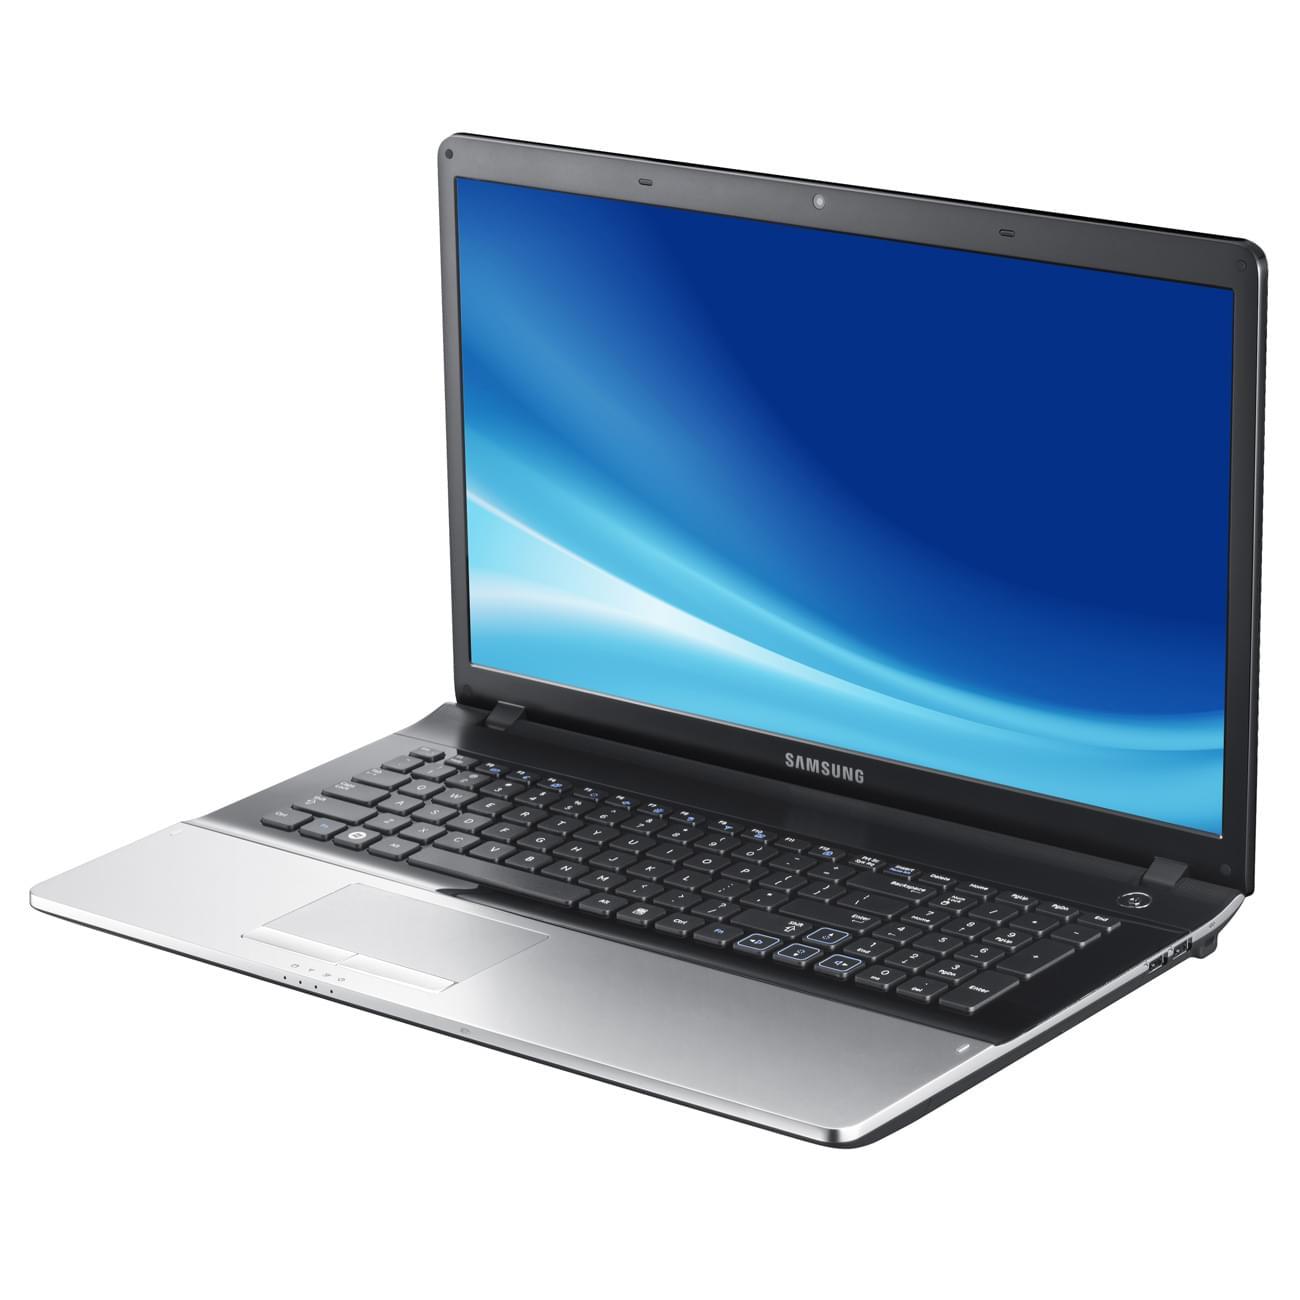 Samsung NP300E7A-A05 (NP300E7A-A05FR) - Achat / Vente PC Portable sur Cybertek.fr - 0